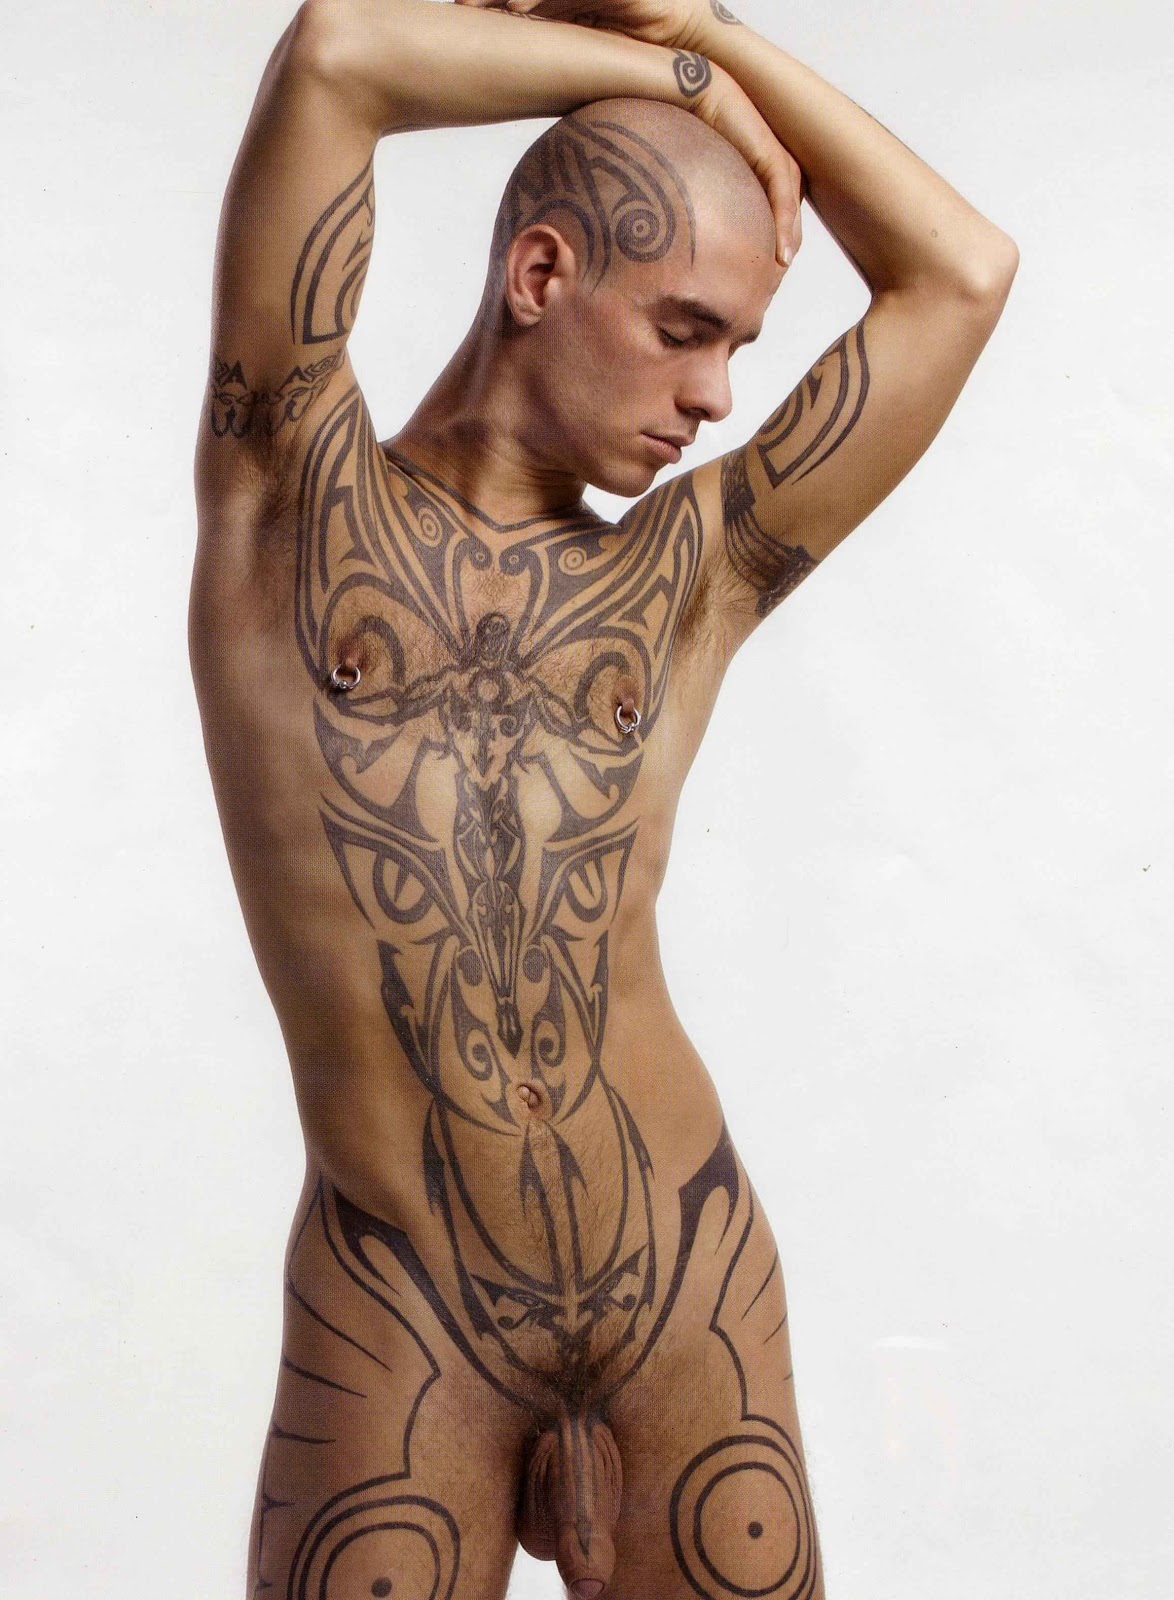 Tattooed nude man with full boner